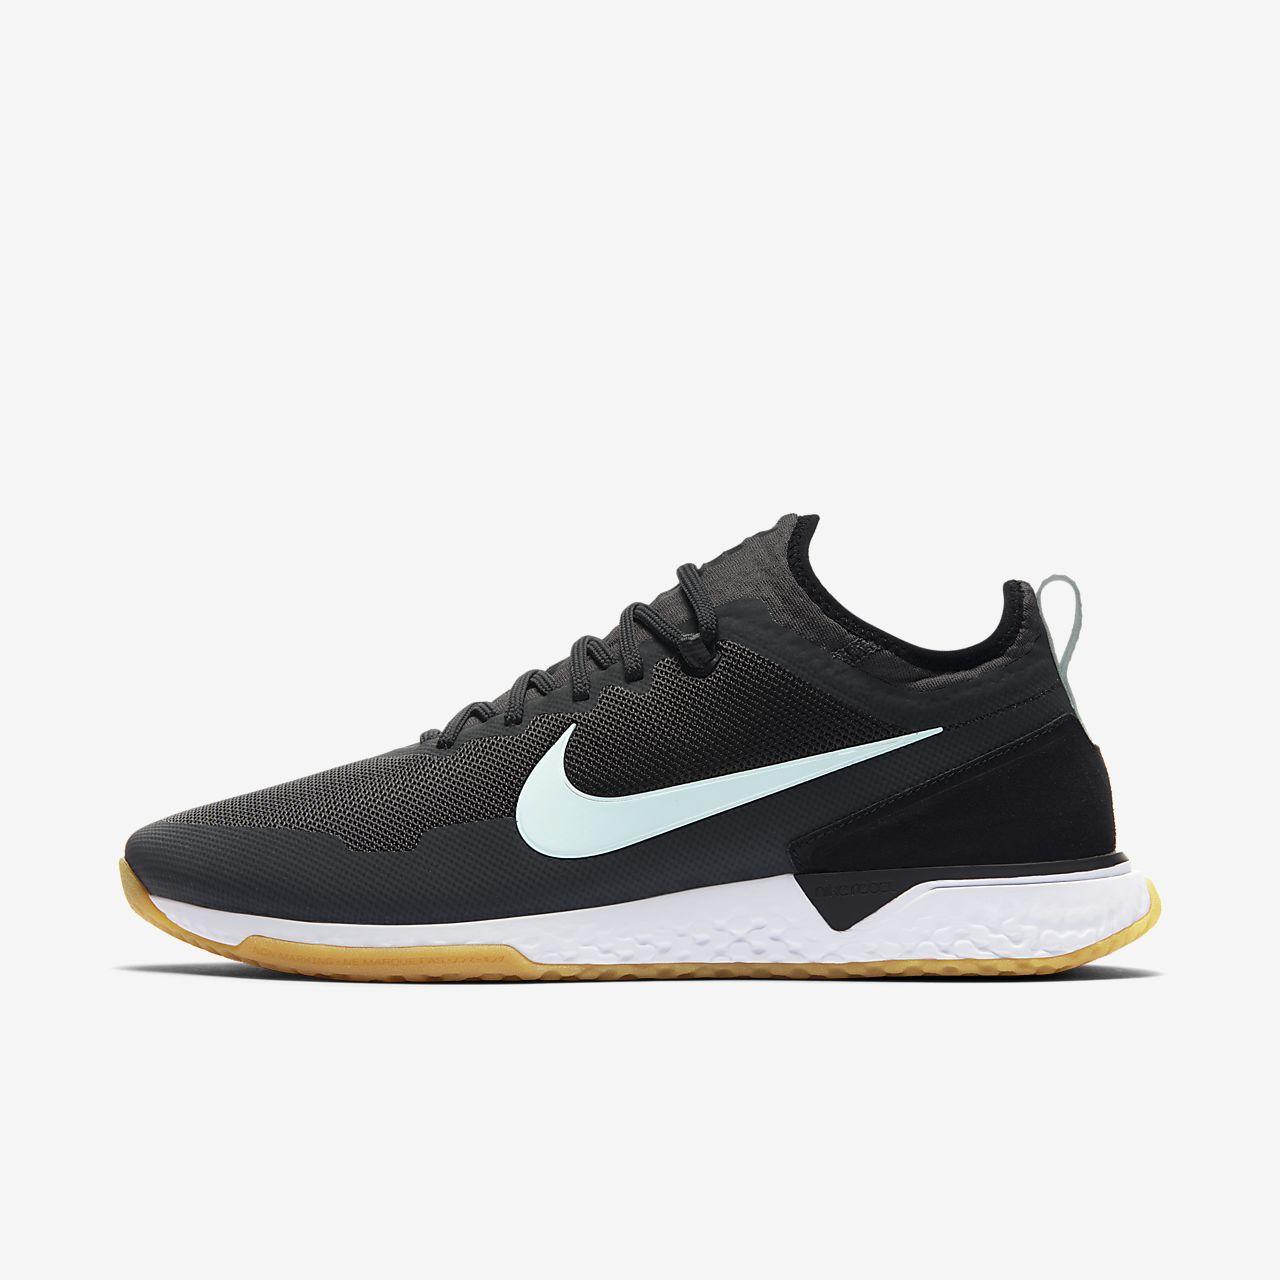 Nike F.C. Football Shoe